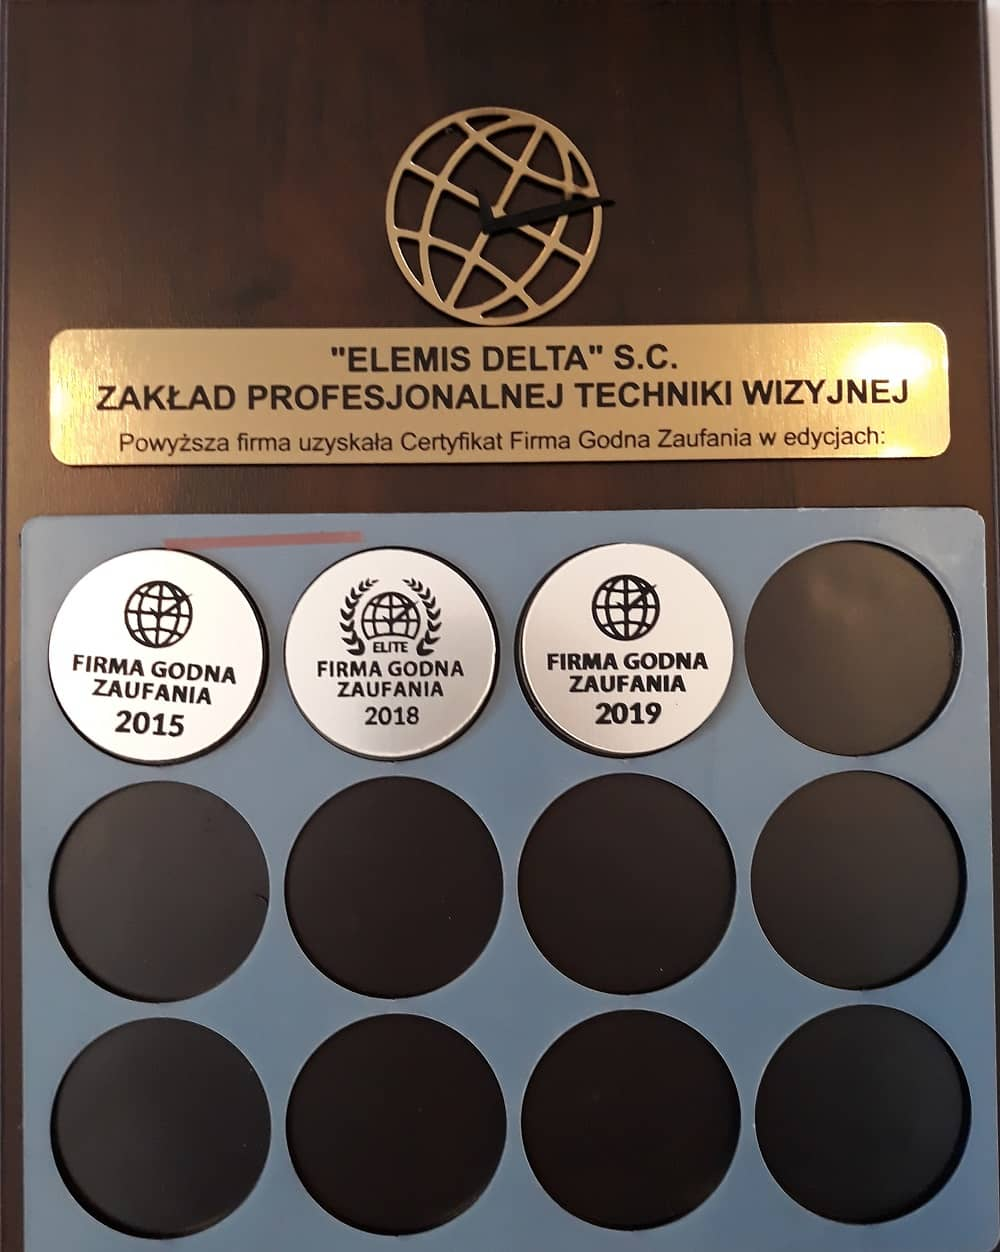 certyfikat2-elemis-delta (2)